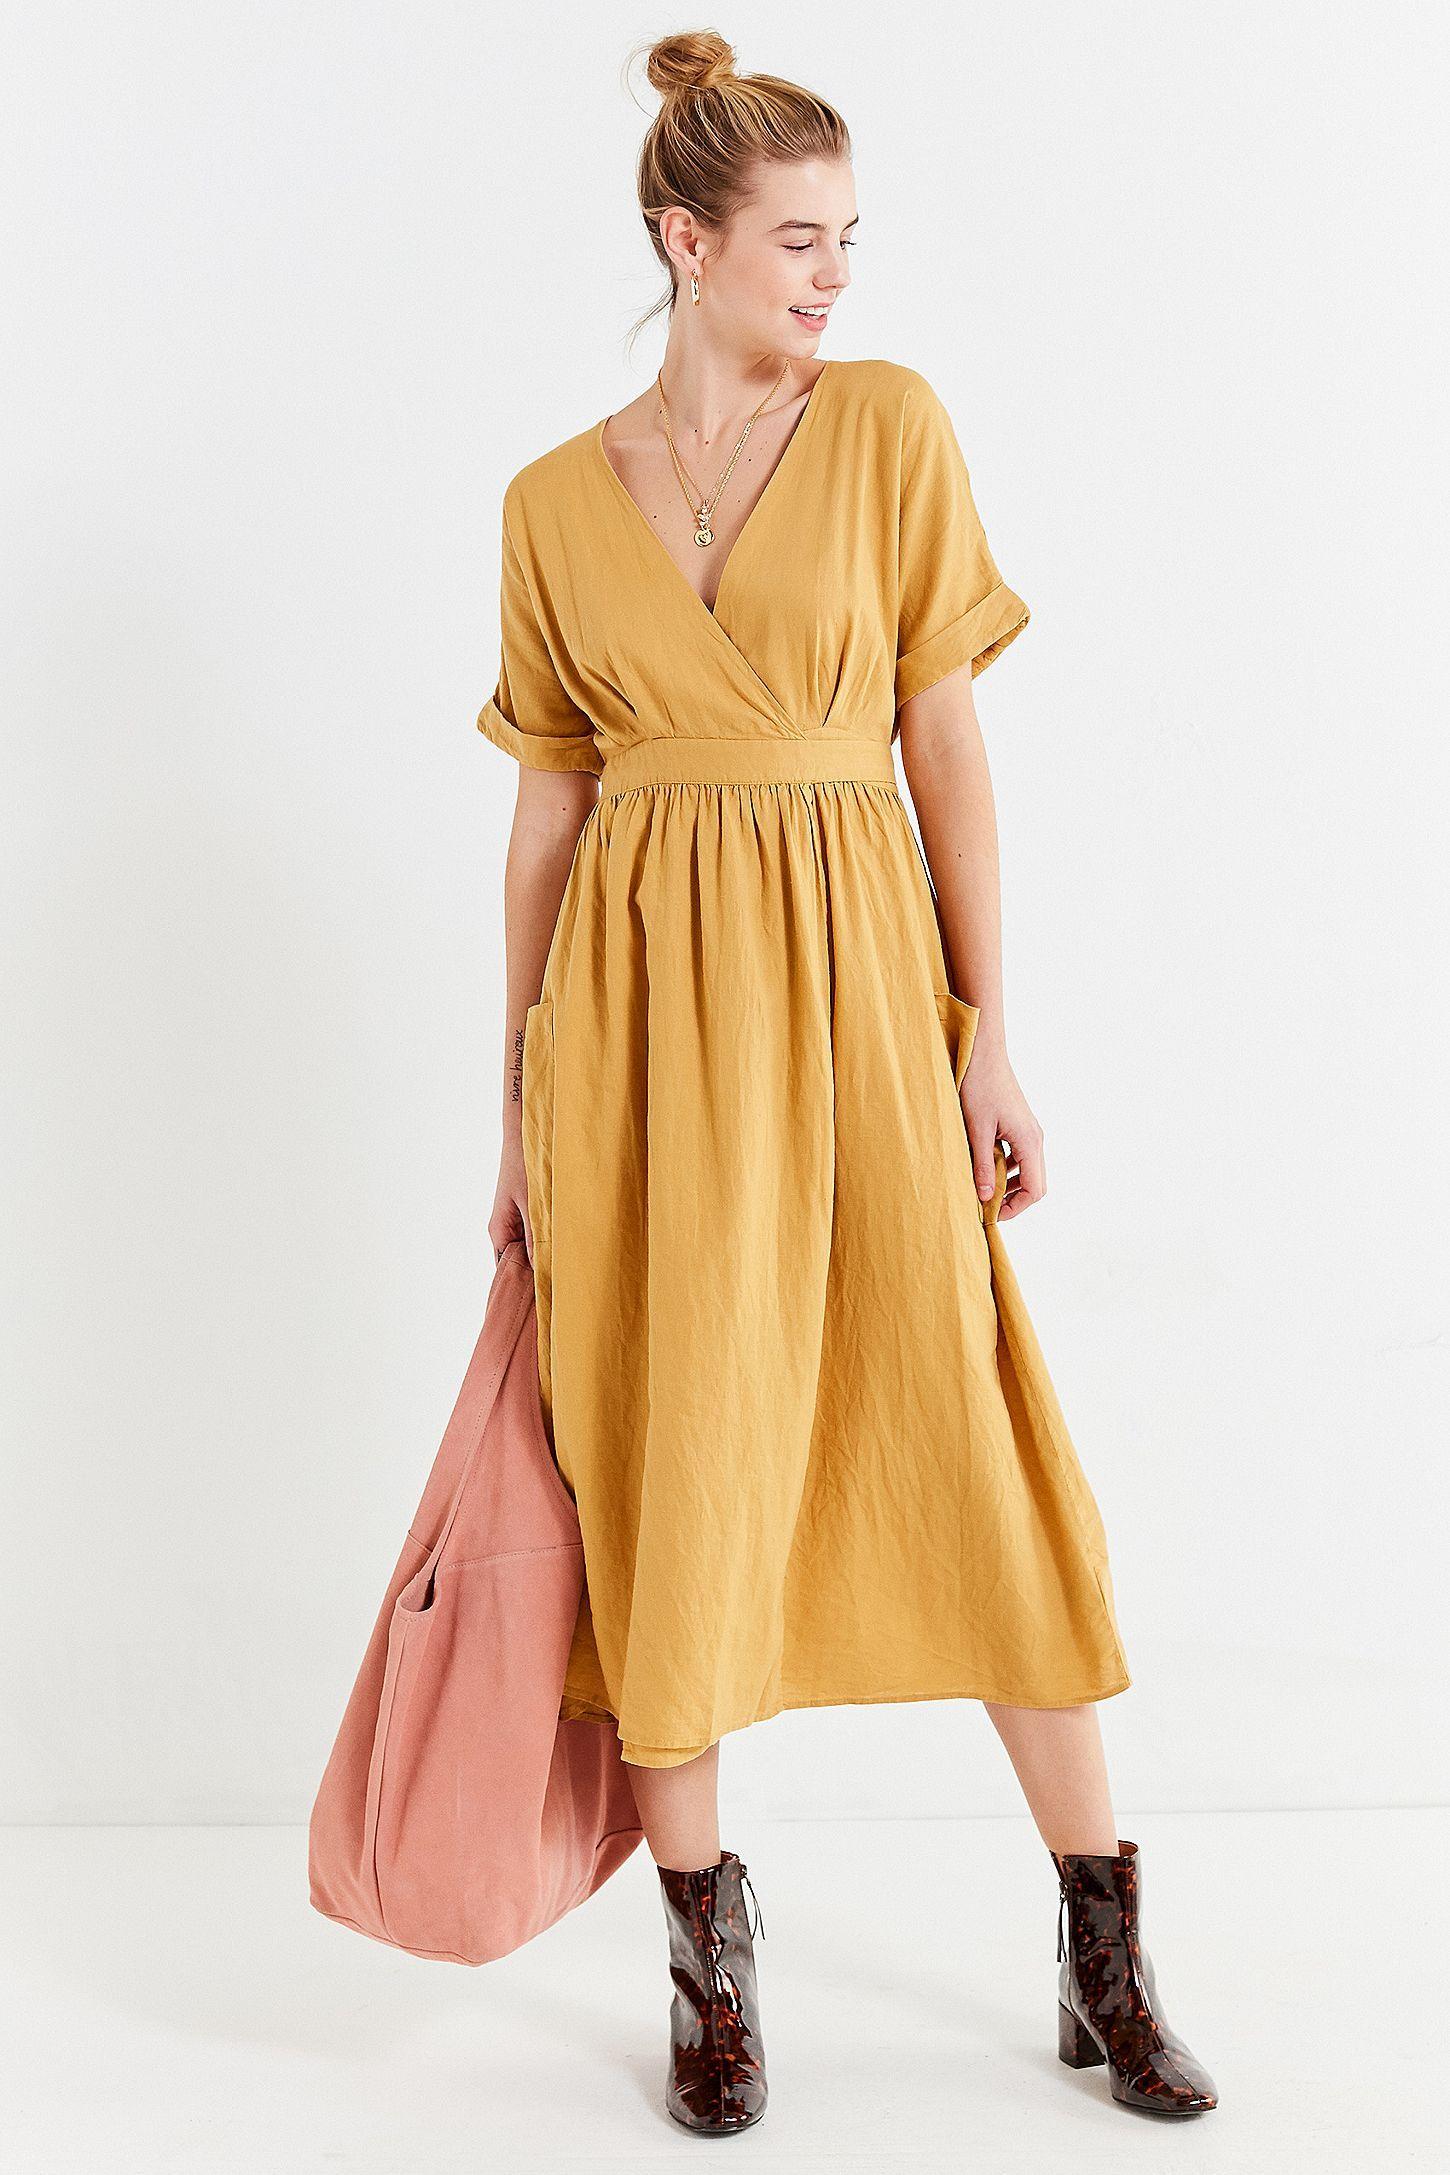 05c5bb1ba60e4 Slide View: 6: UO Gabrielle Gold Linen Midi Wrap Dress | My style ...